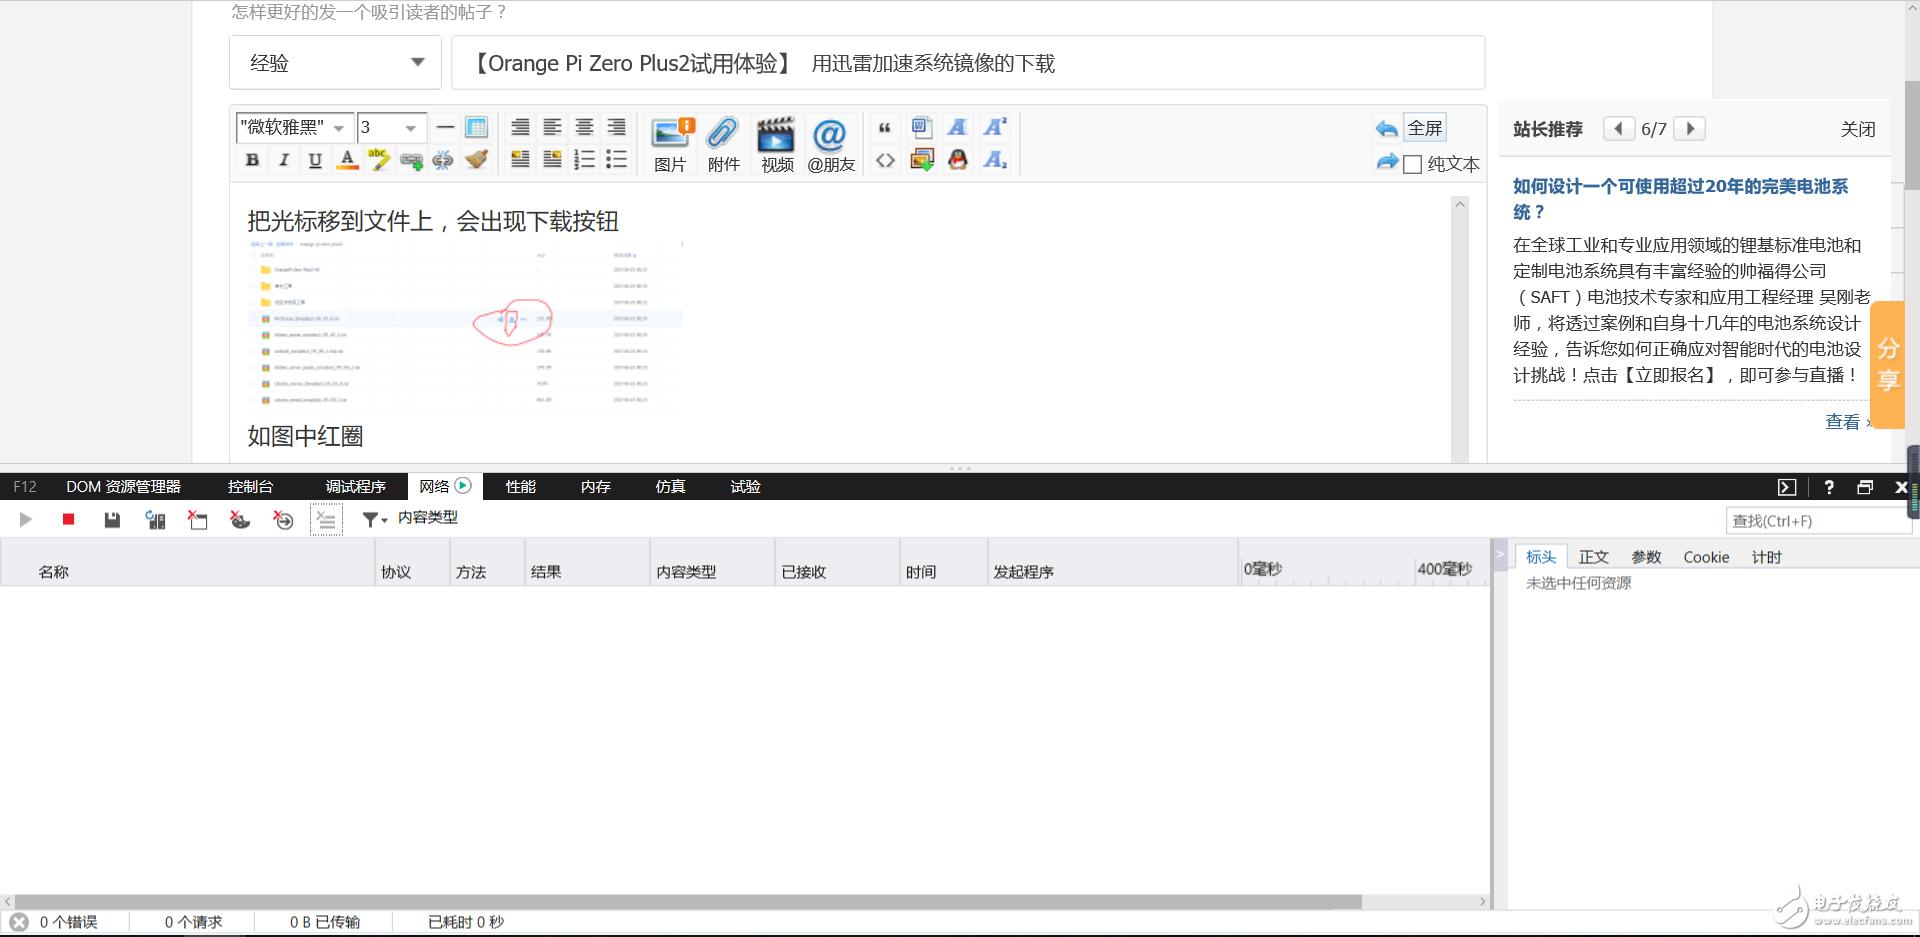 【Orange Pi Zero Plus2试用体验】用迅雷加速系统镜像的下载